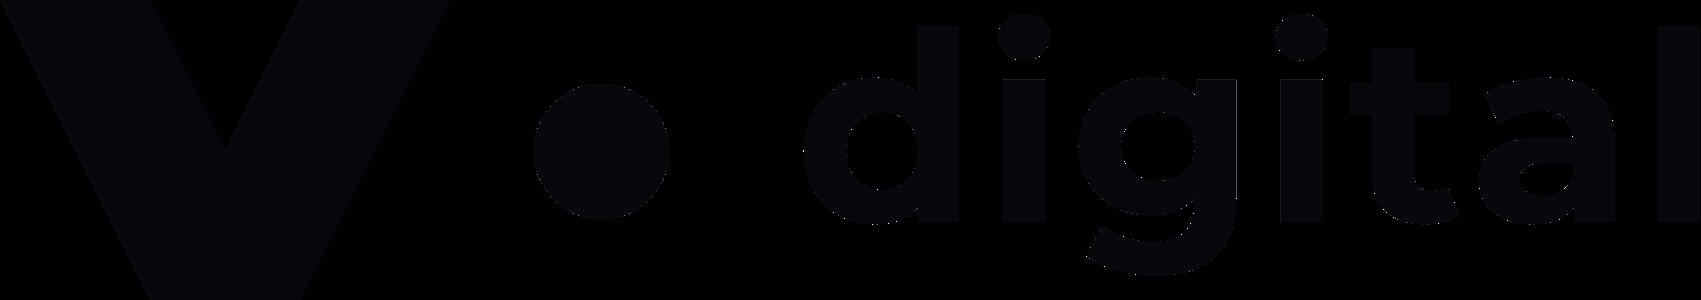 v digital – black